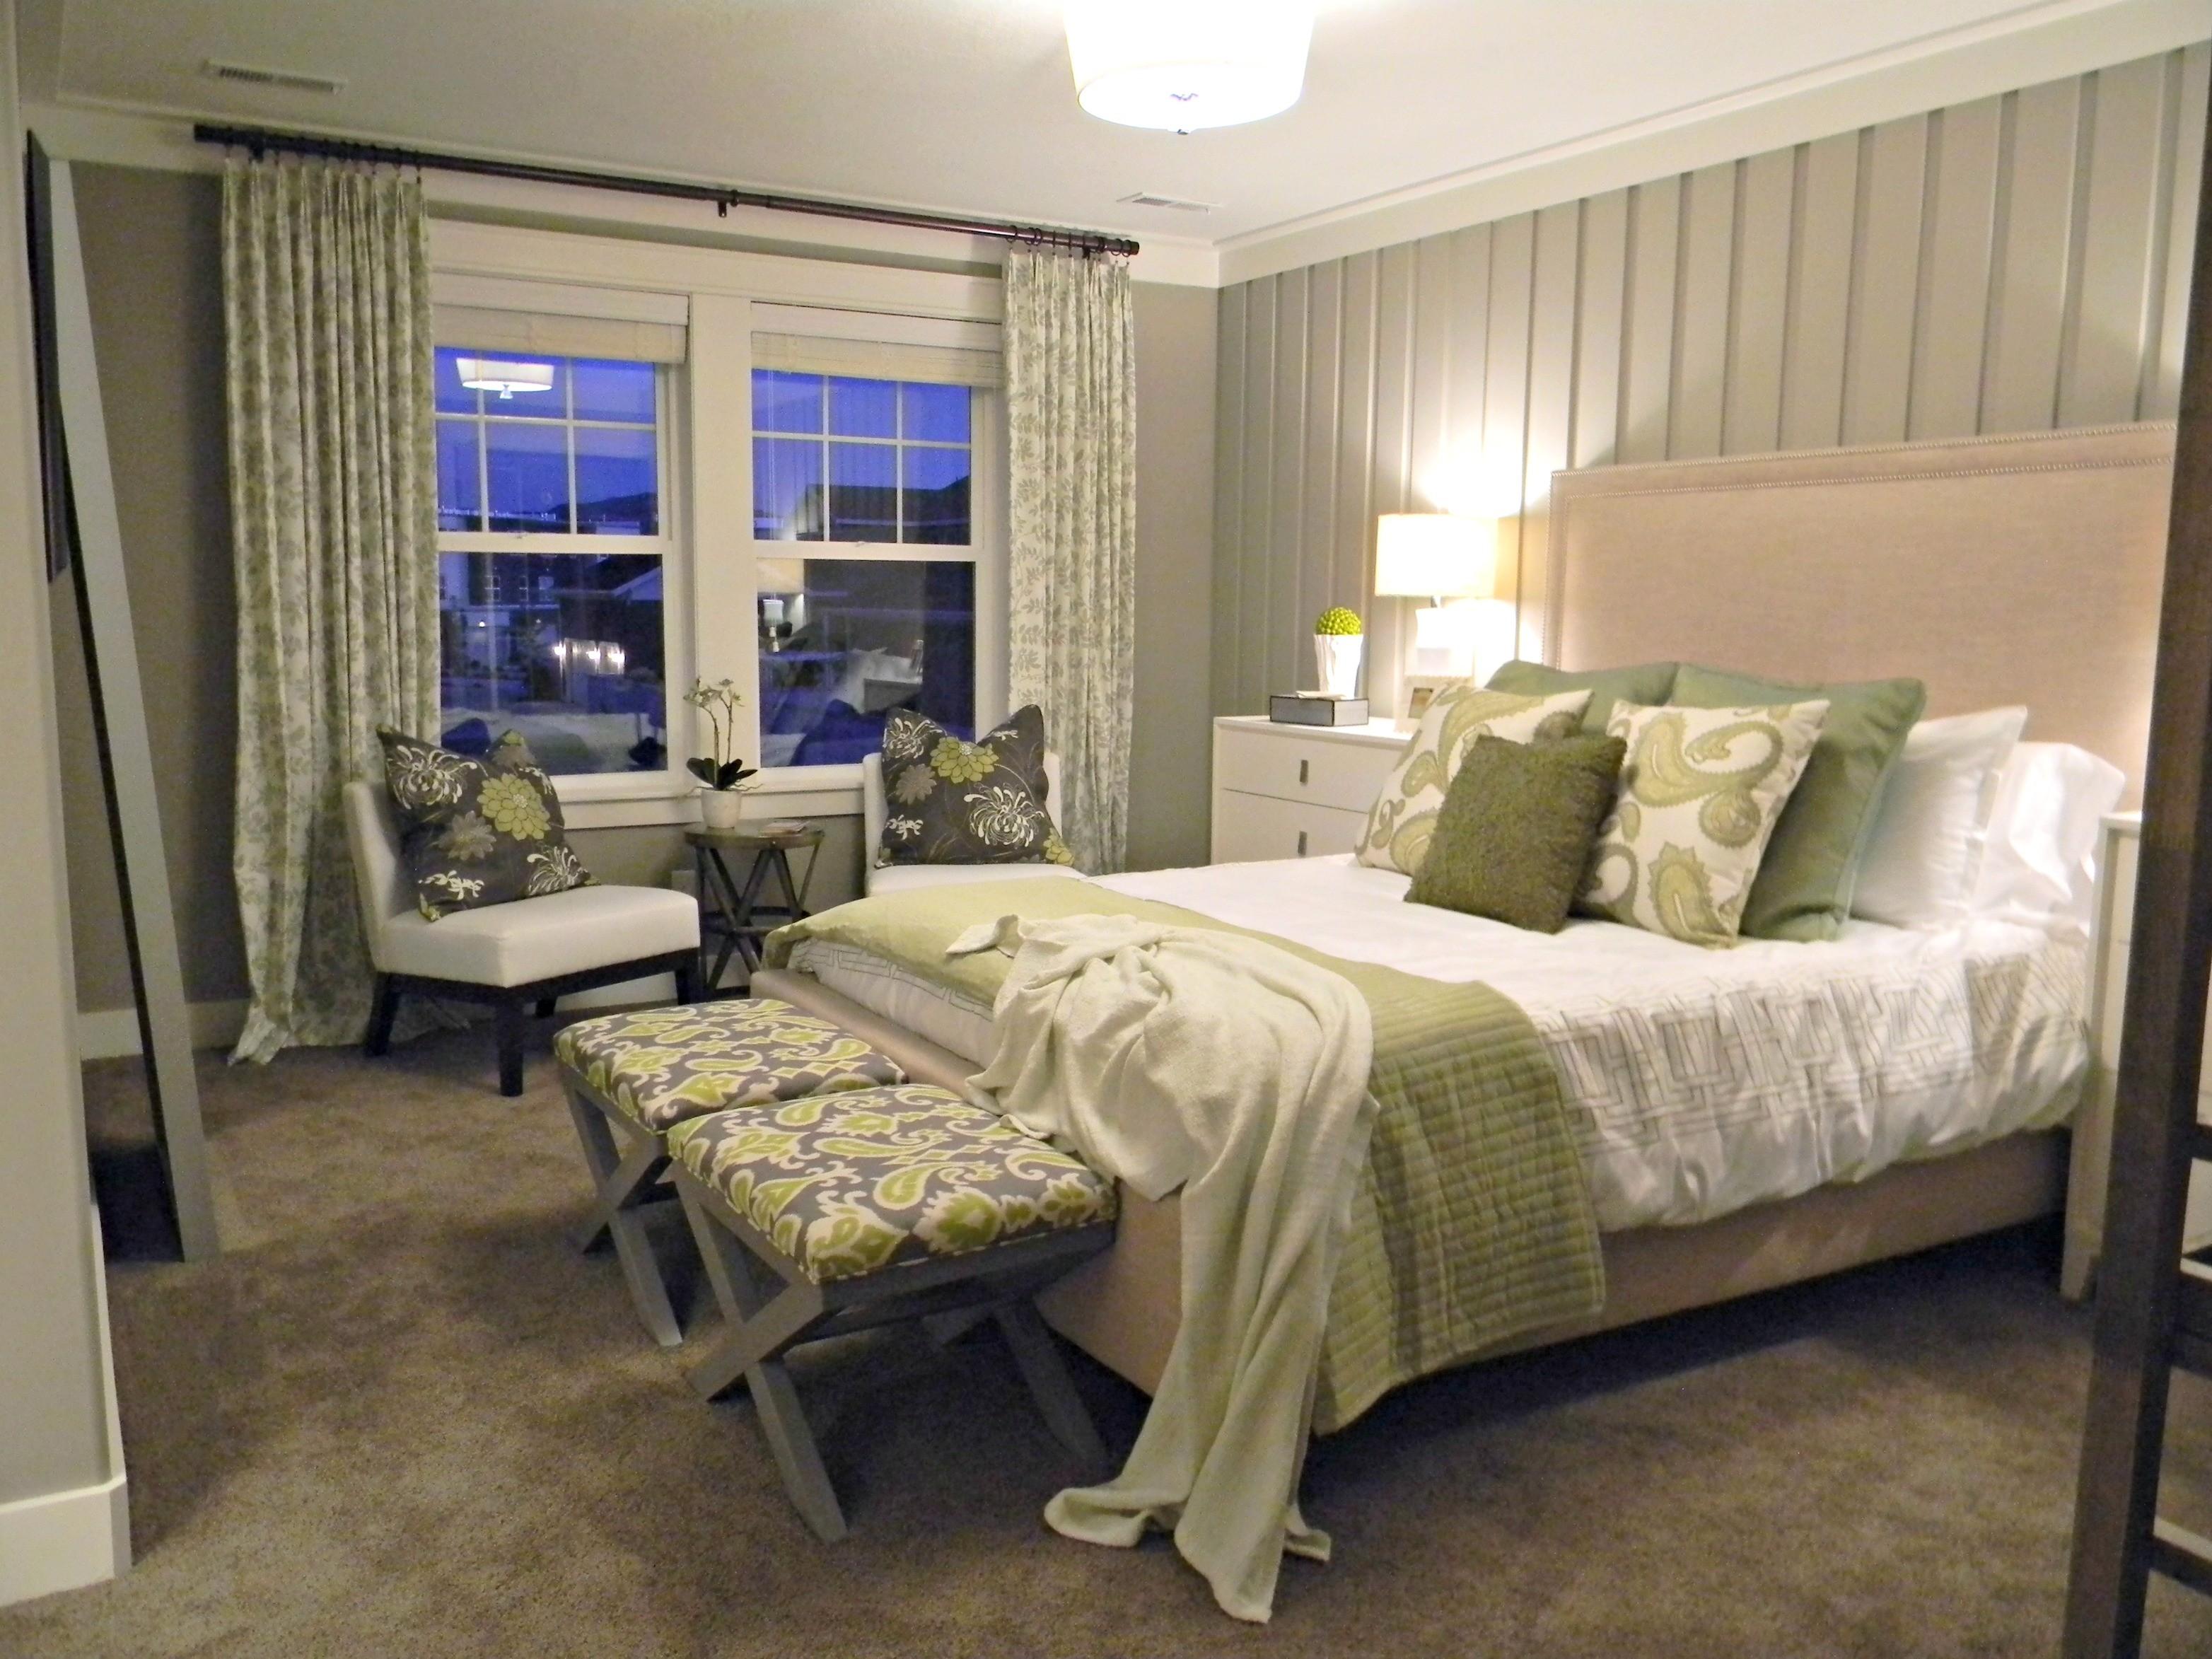 Muebles de habitaci n de matrimonio cehome for Muebles de matrimonio